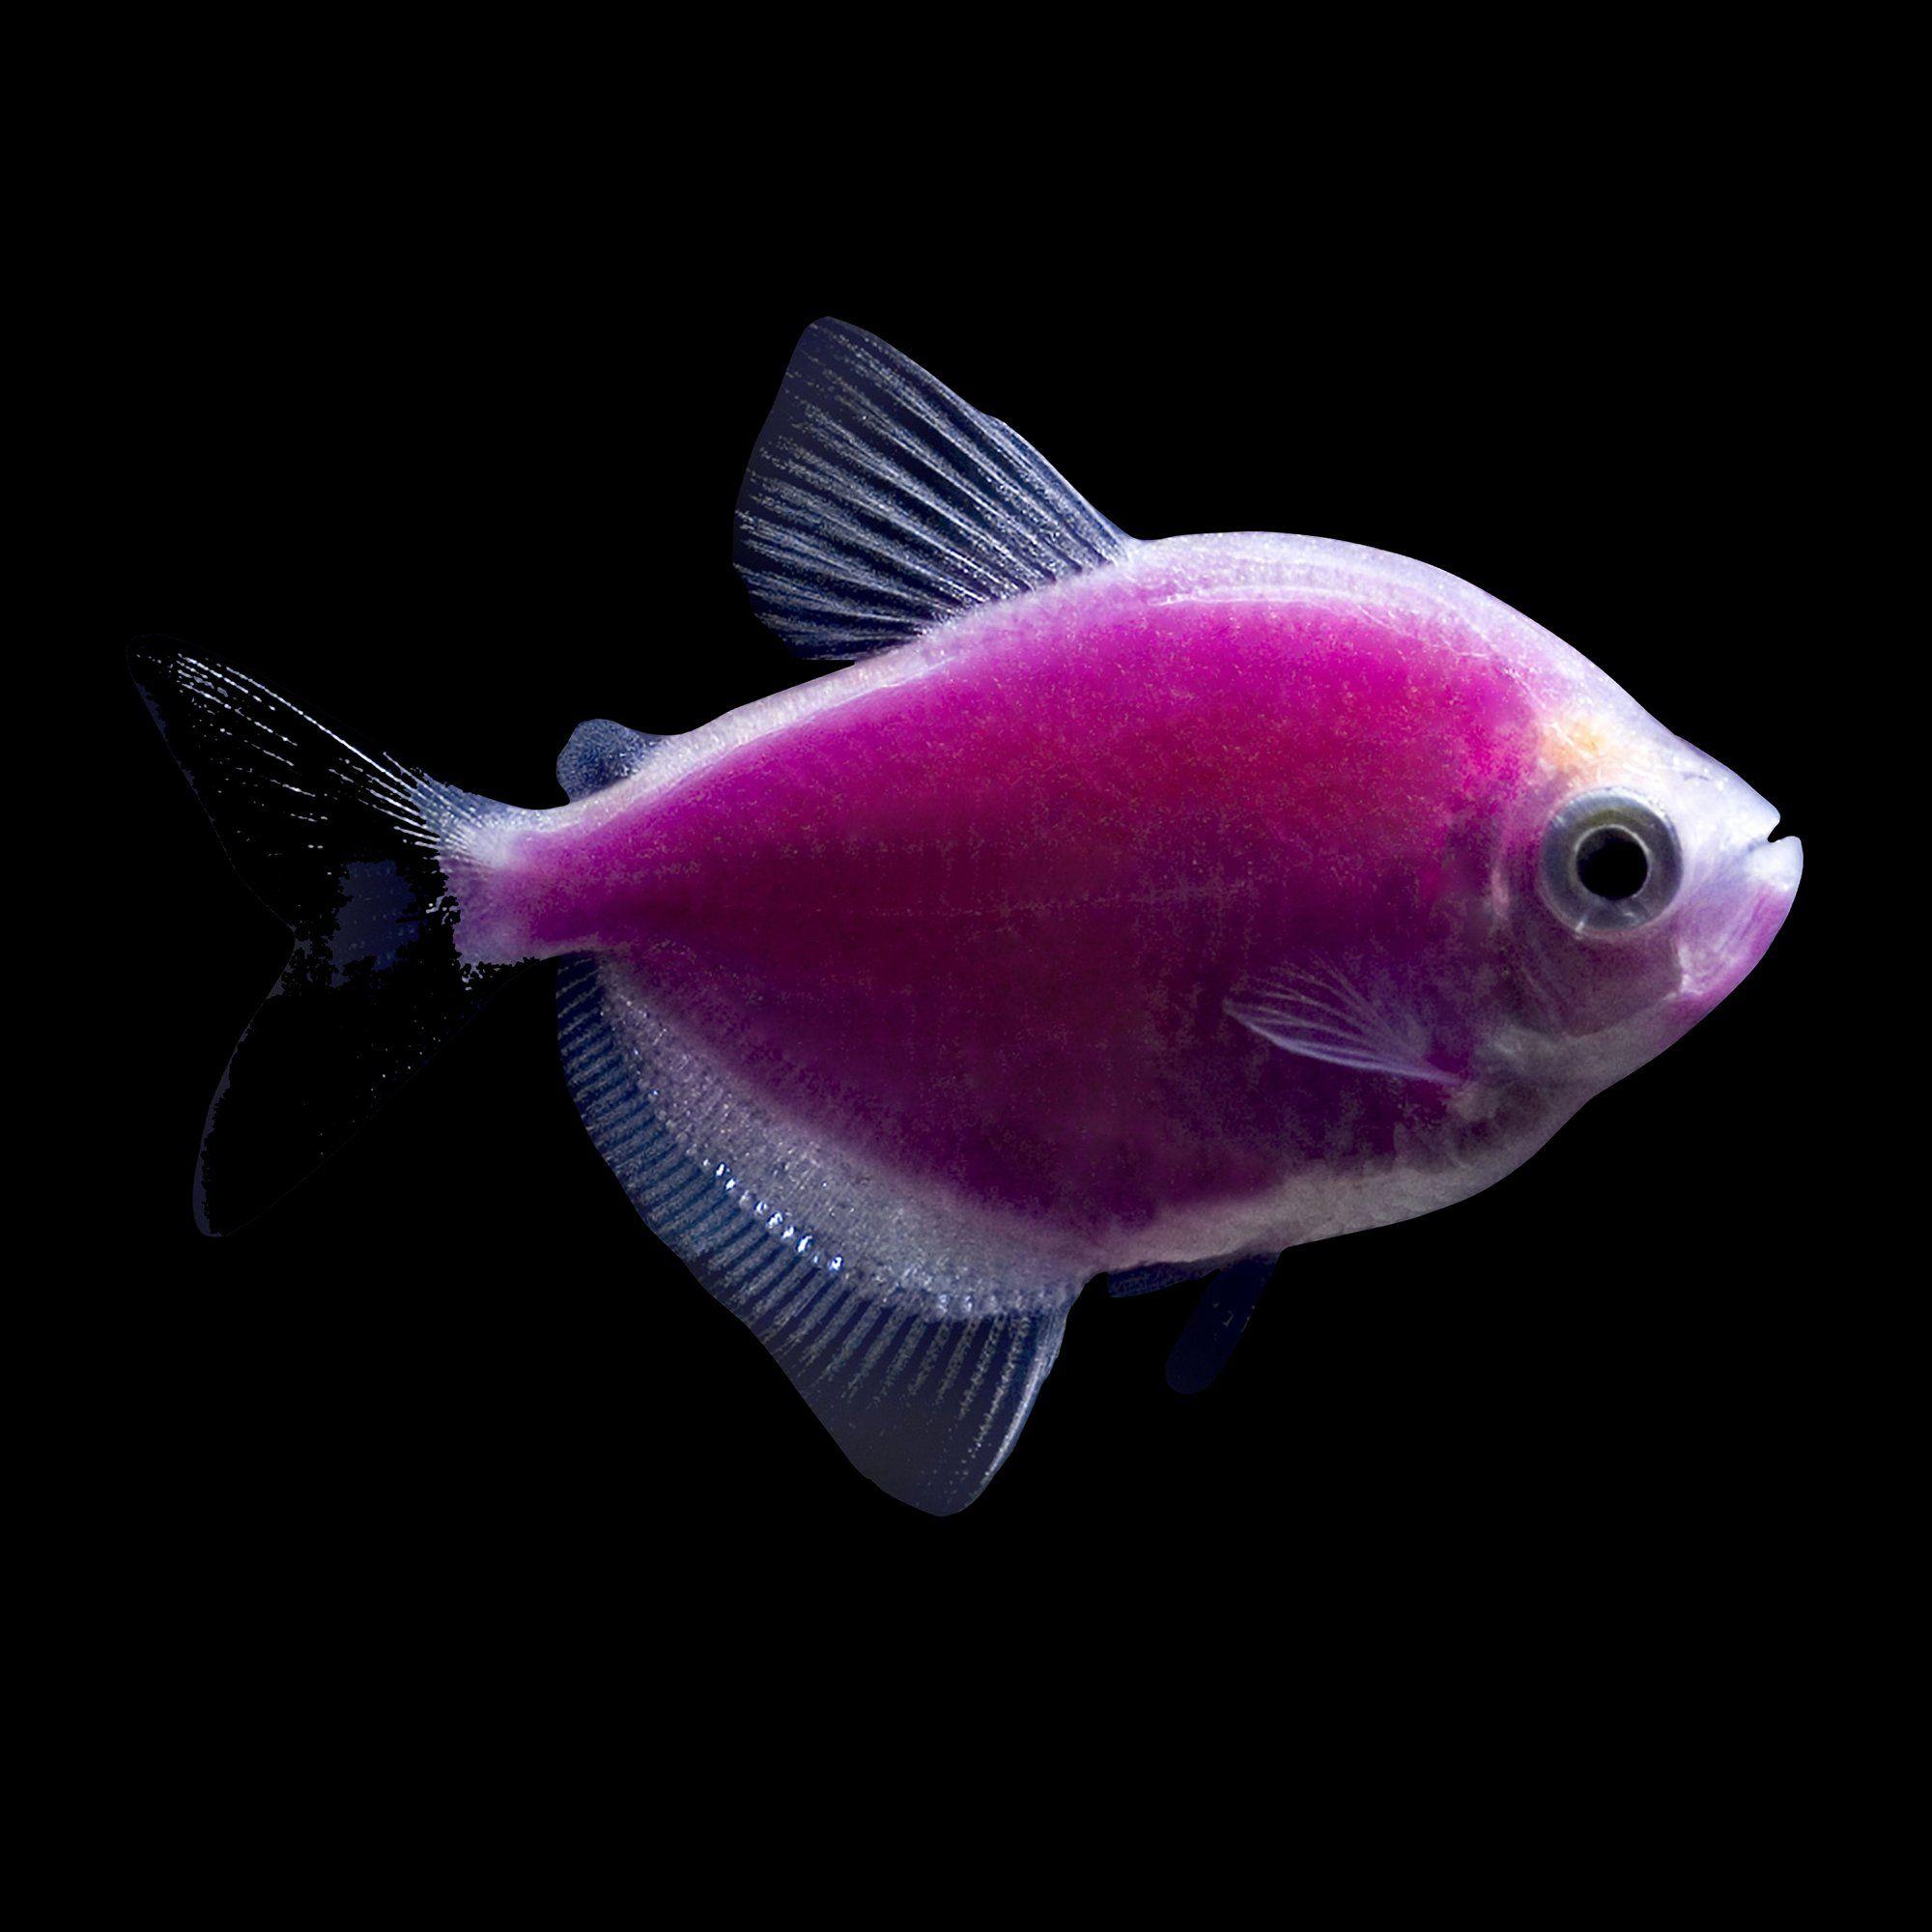 Glofish Galactic Purple Tetras For Sale Petco In 2020 Glofish Freshwater Aquarium Fish Pet Fish